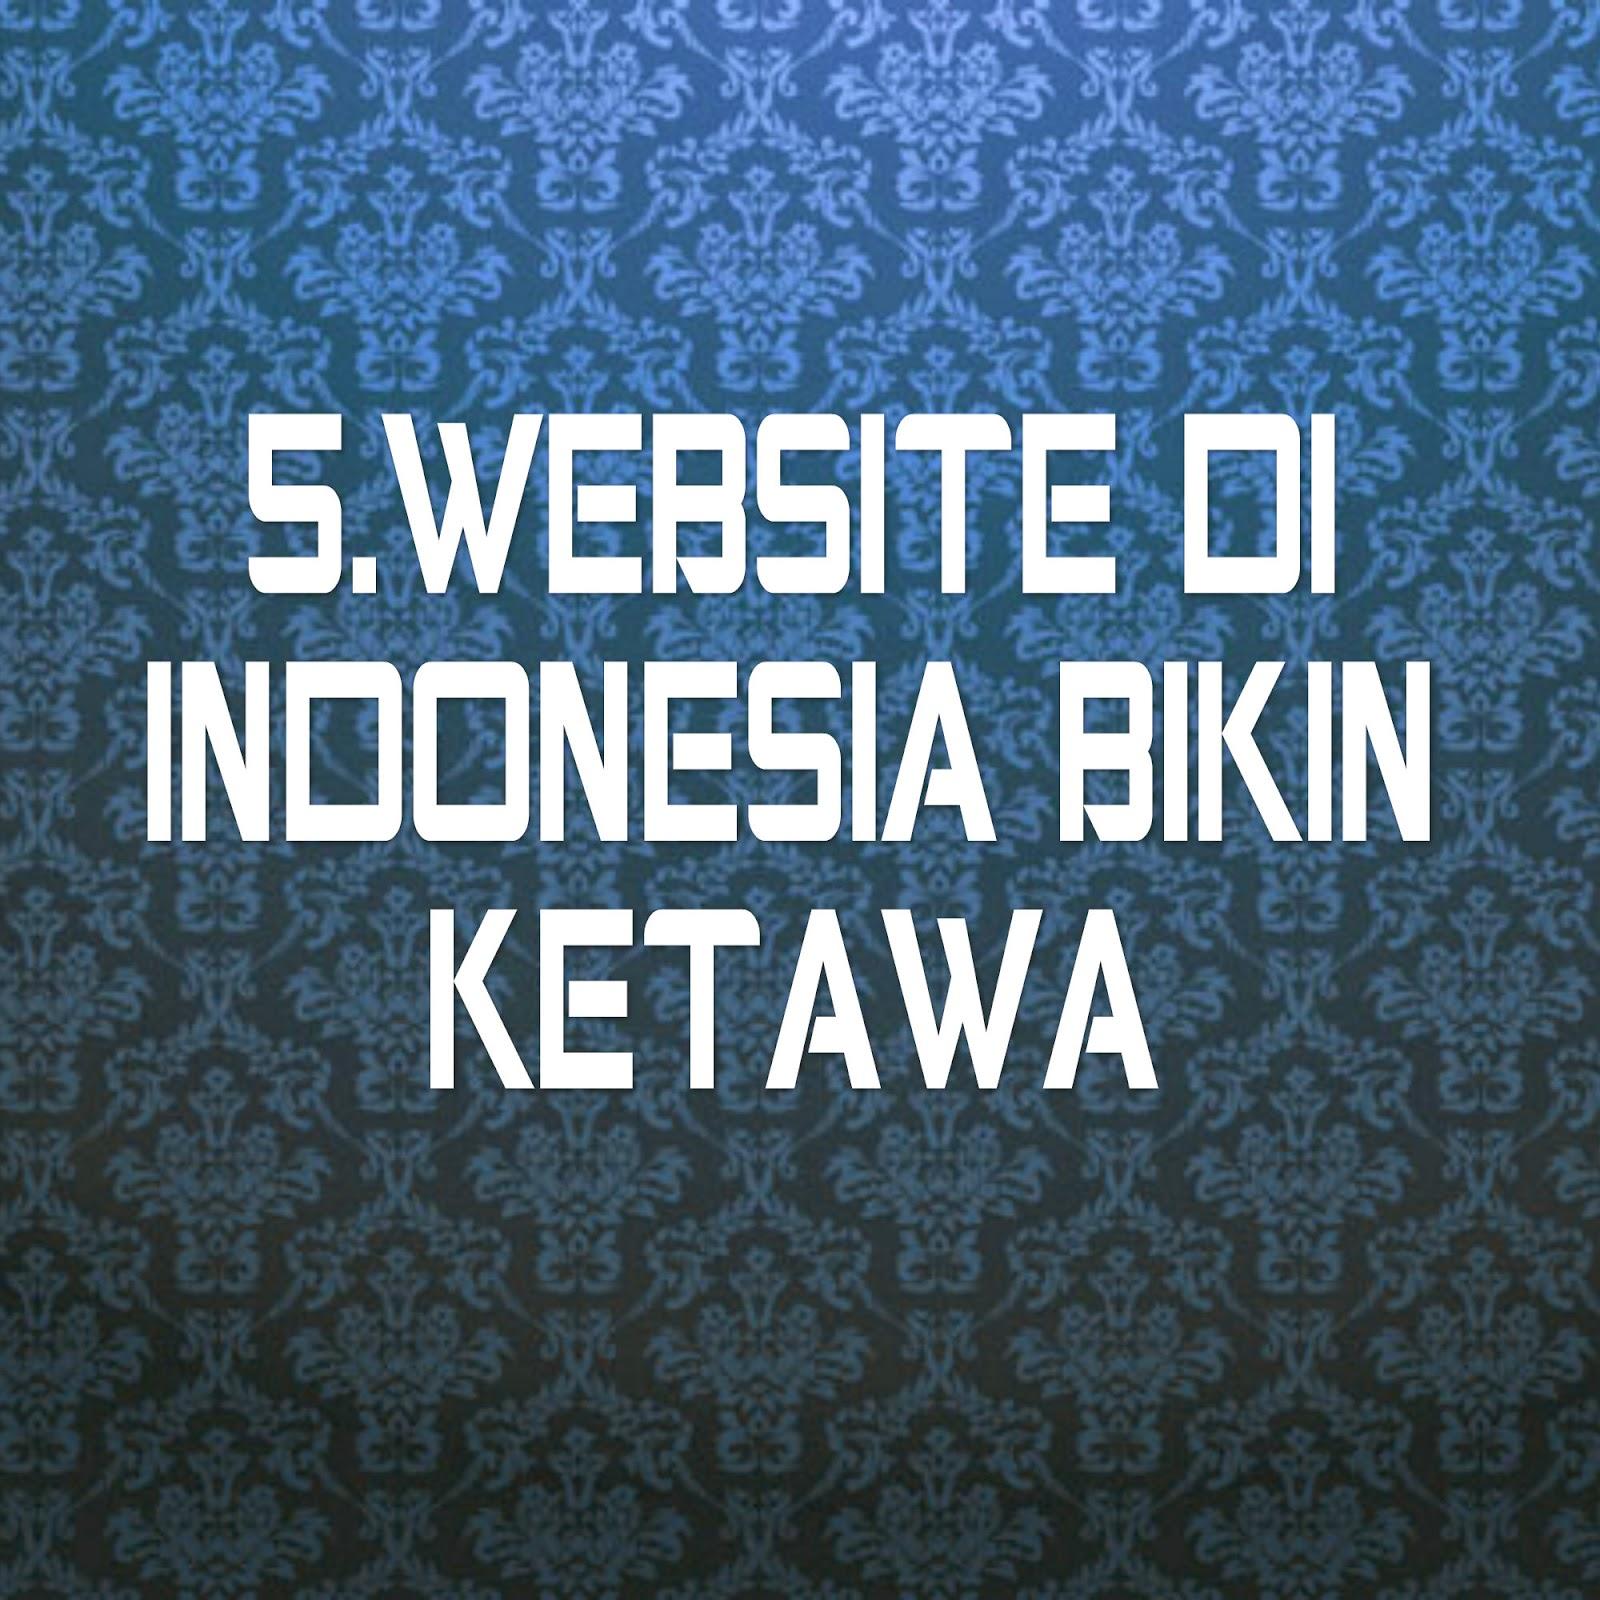 5 WEBSITE DI INDONESIA BIKIN KETAWA DAFFACOEG